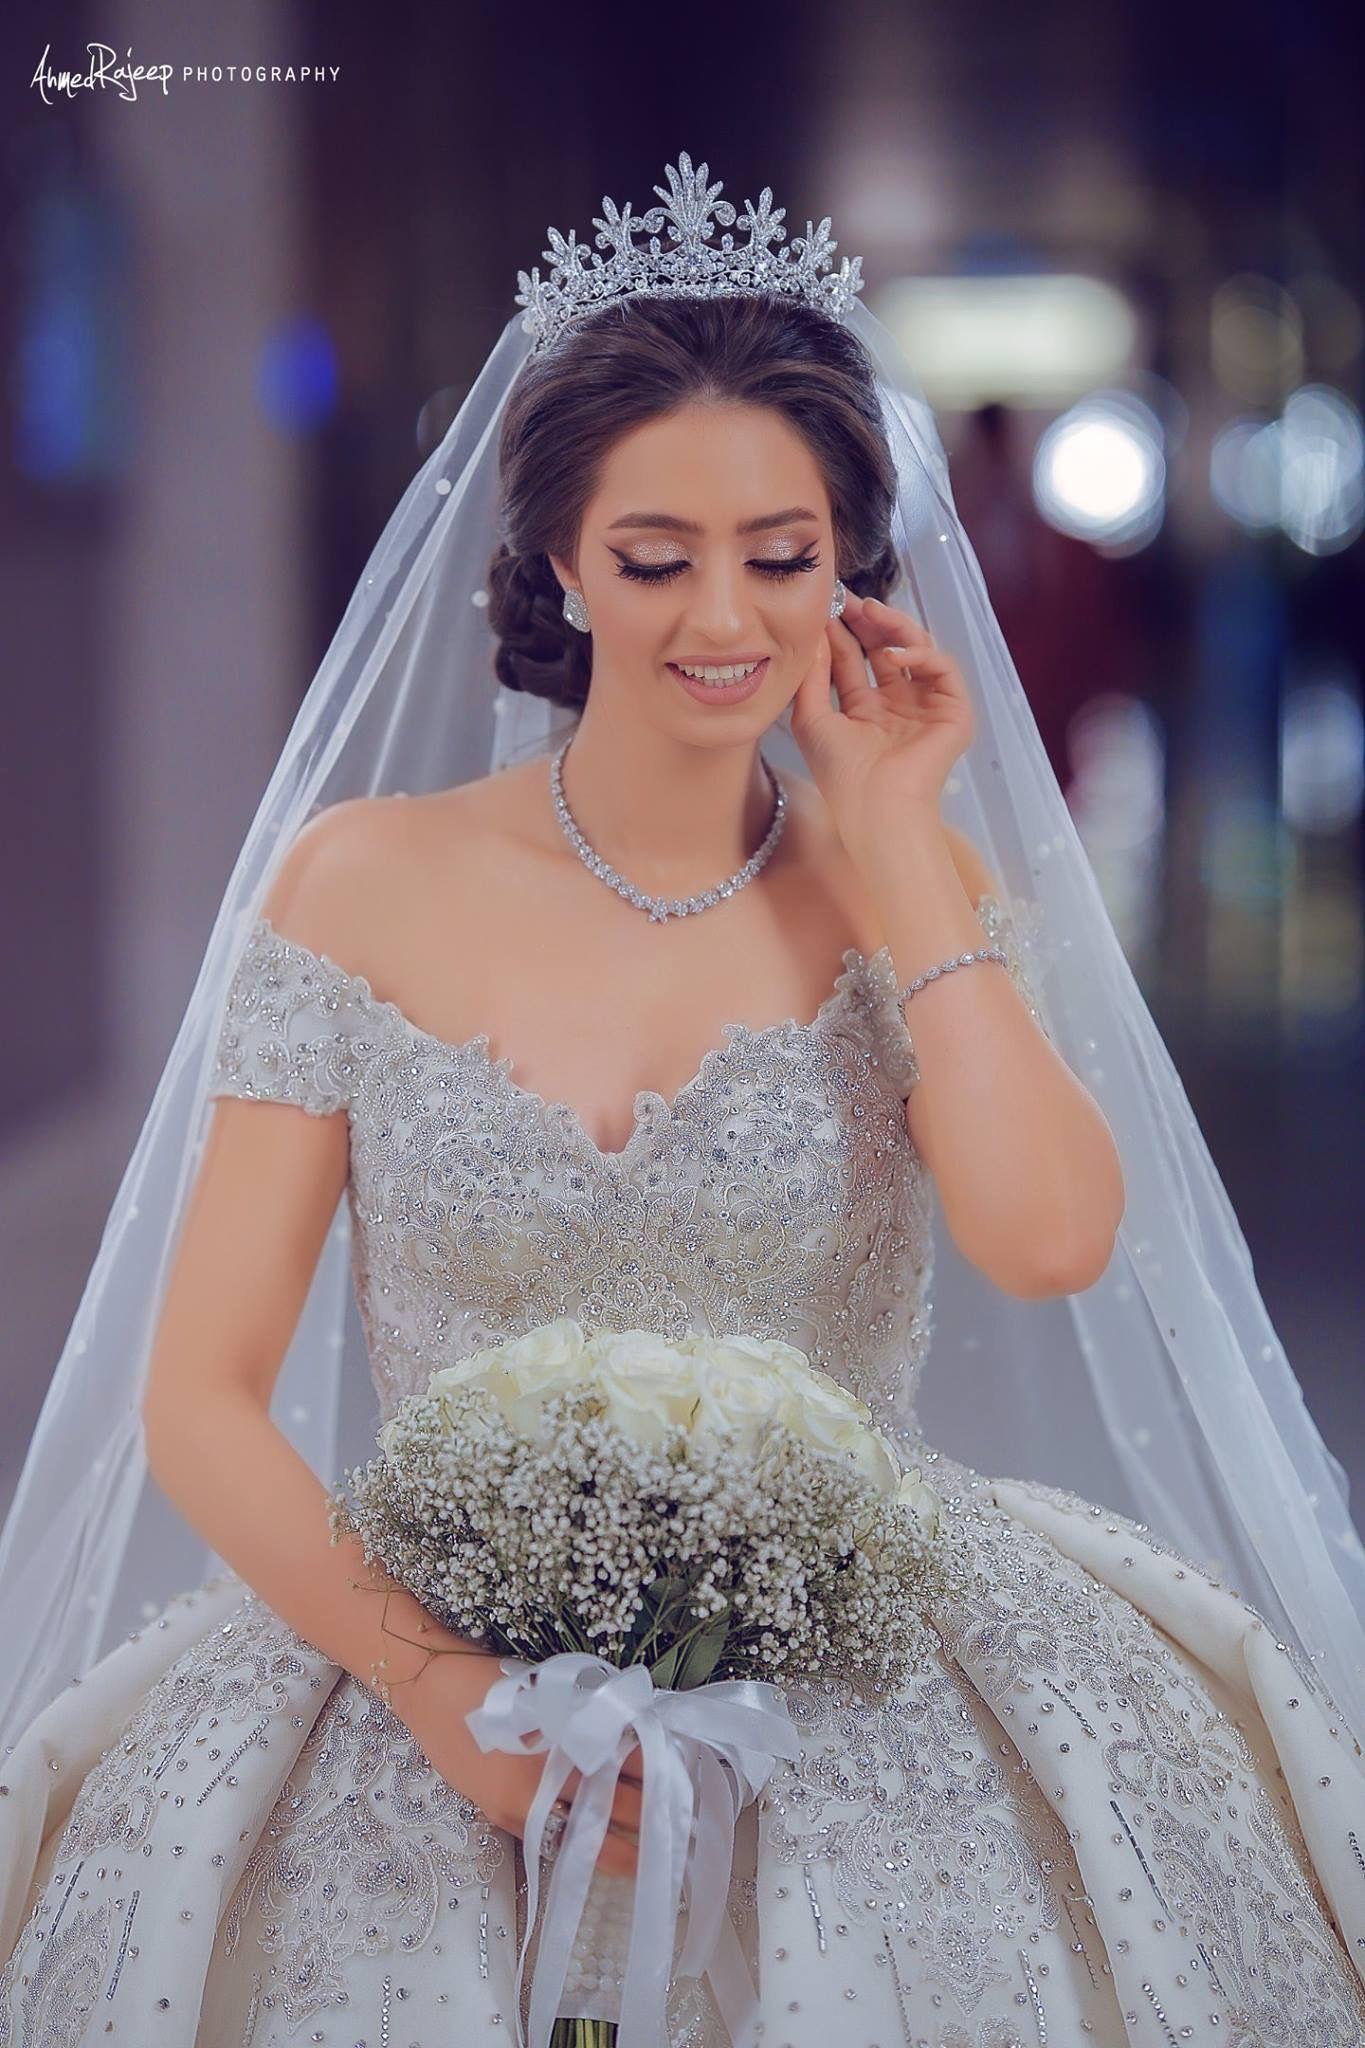 Pin De Rocio Castanon En Hermosos Vestidos De Novia En 2020 Hermosos Vestidos De Novia Vestidos De Novia Princesa Vestidos De Novia